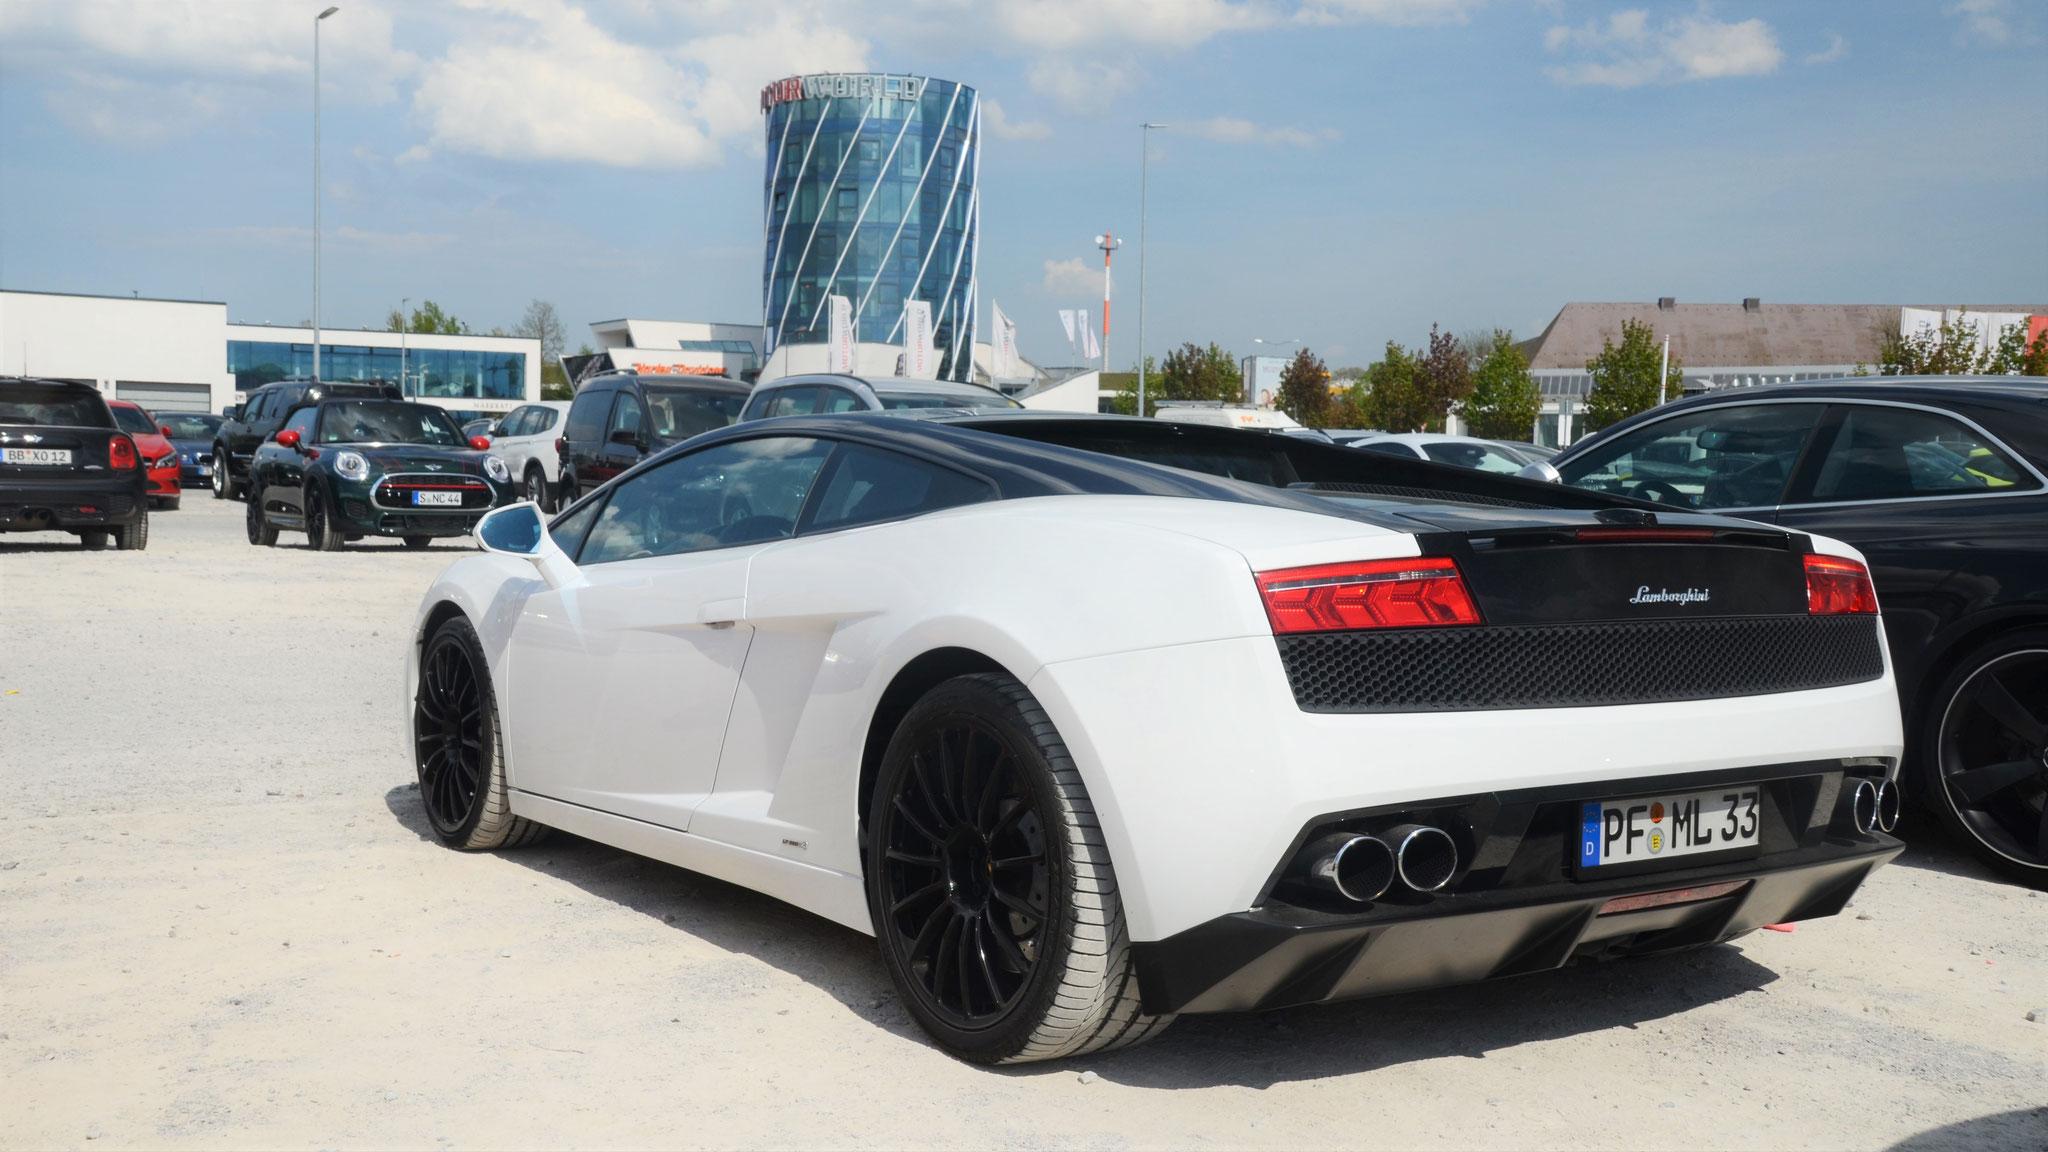 Lamborghini Gallardo LP 550 - PF-ML-33